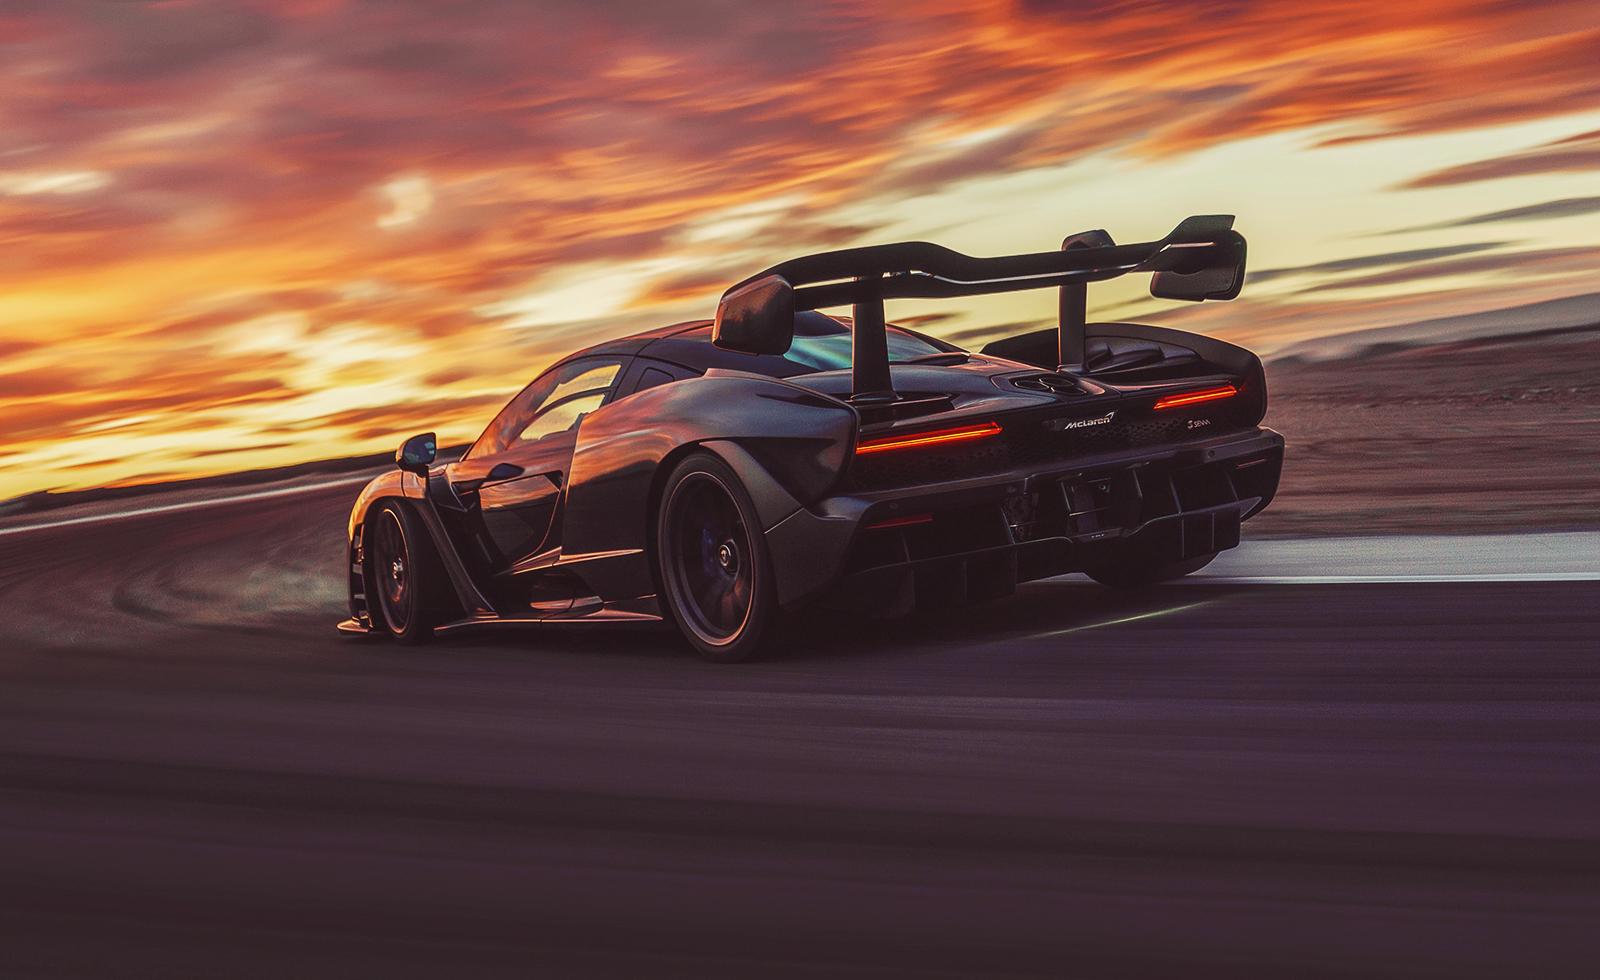 McLaren Senna Dynamic Reveal Richard Pardon Car Photographer.jpg